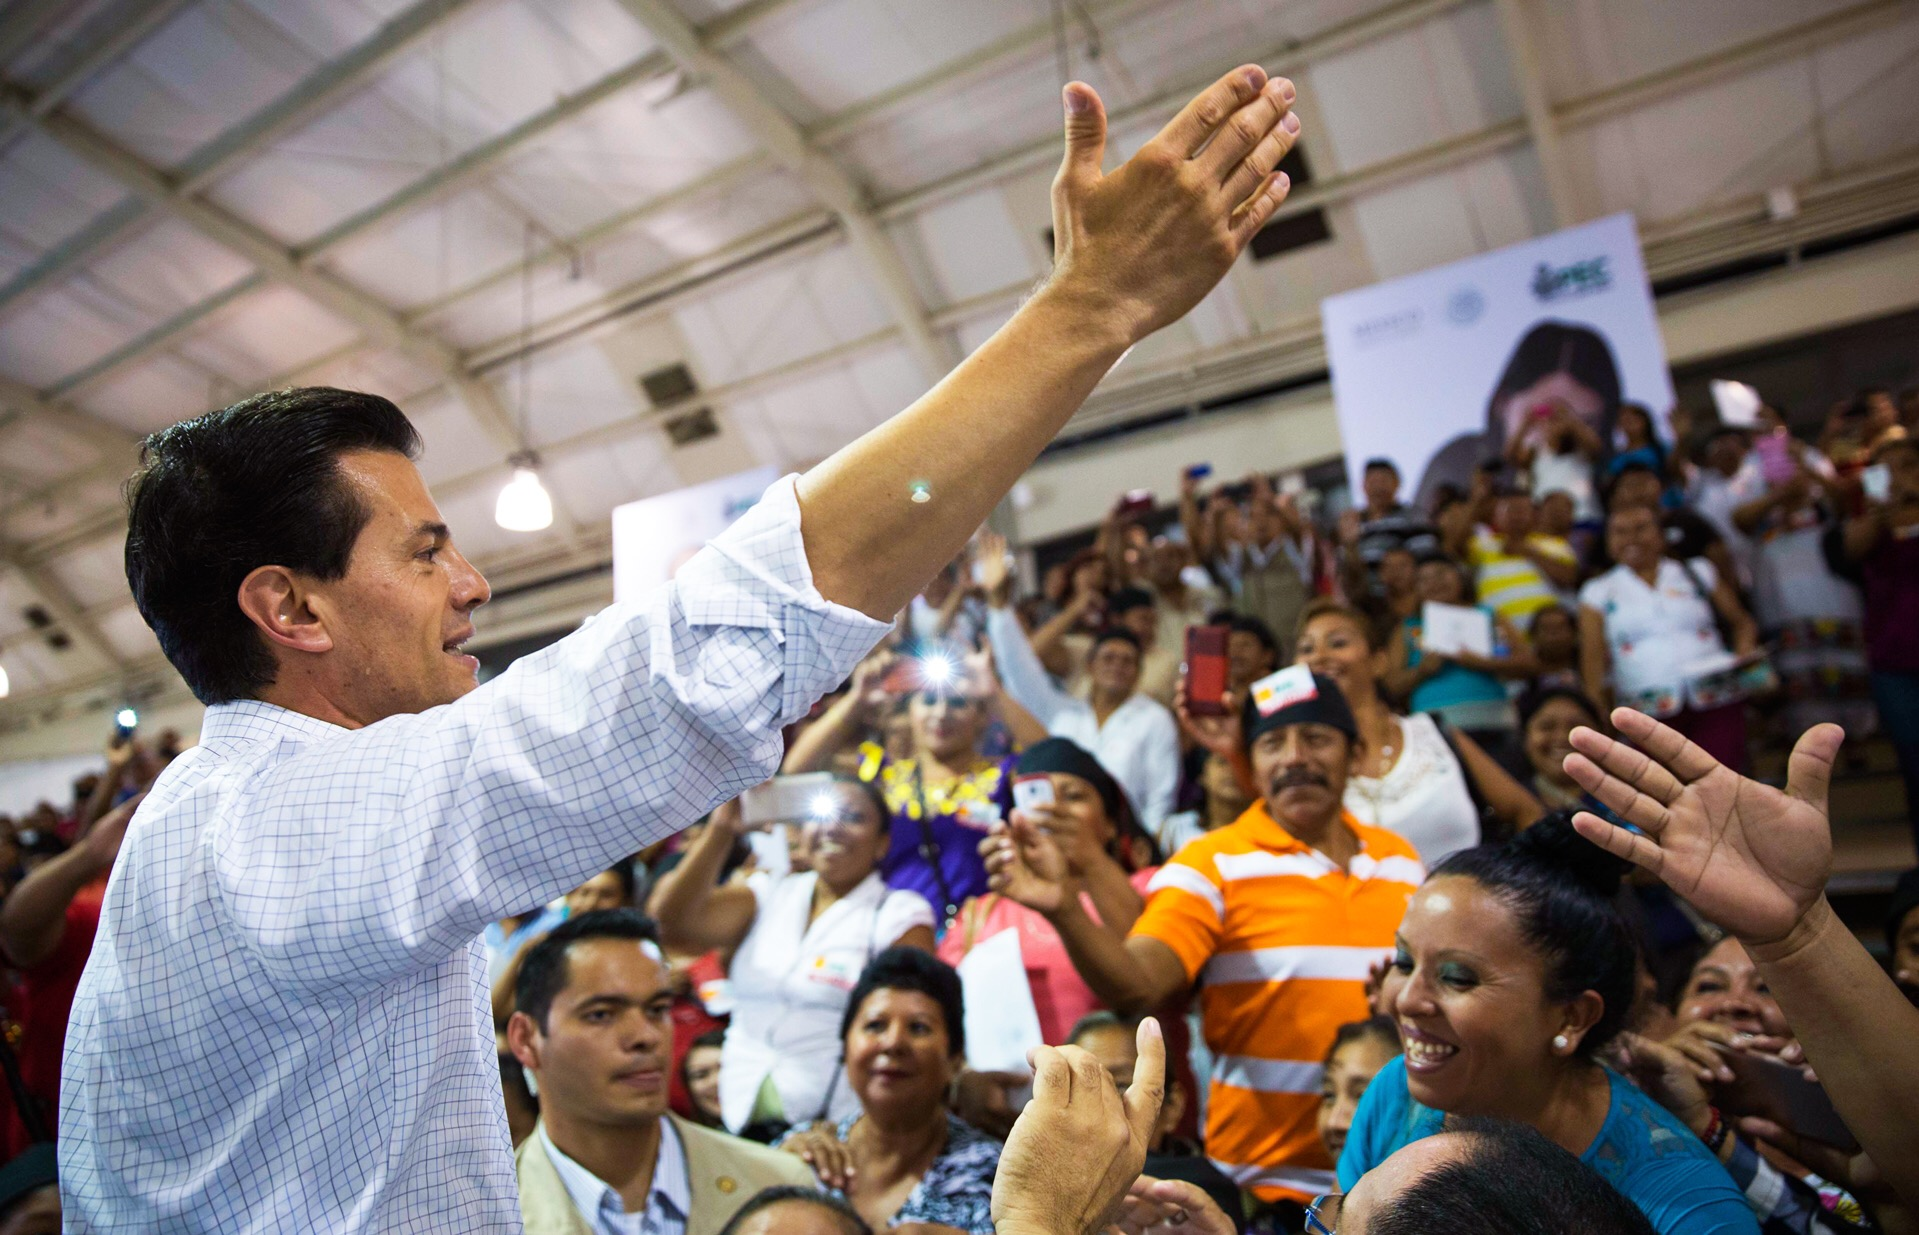 La camisa arremangada de Peña Nieto (crónica)